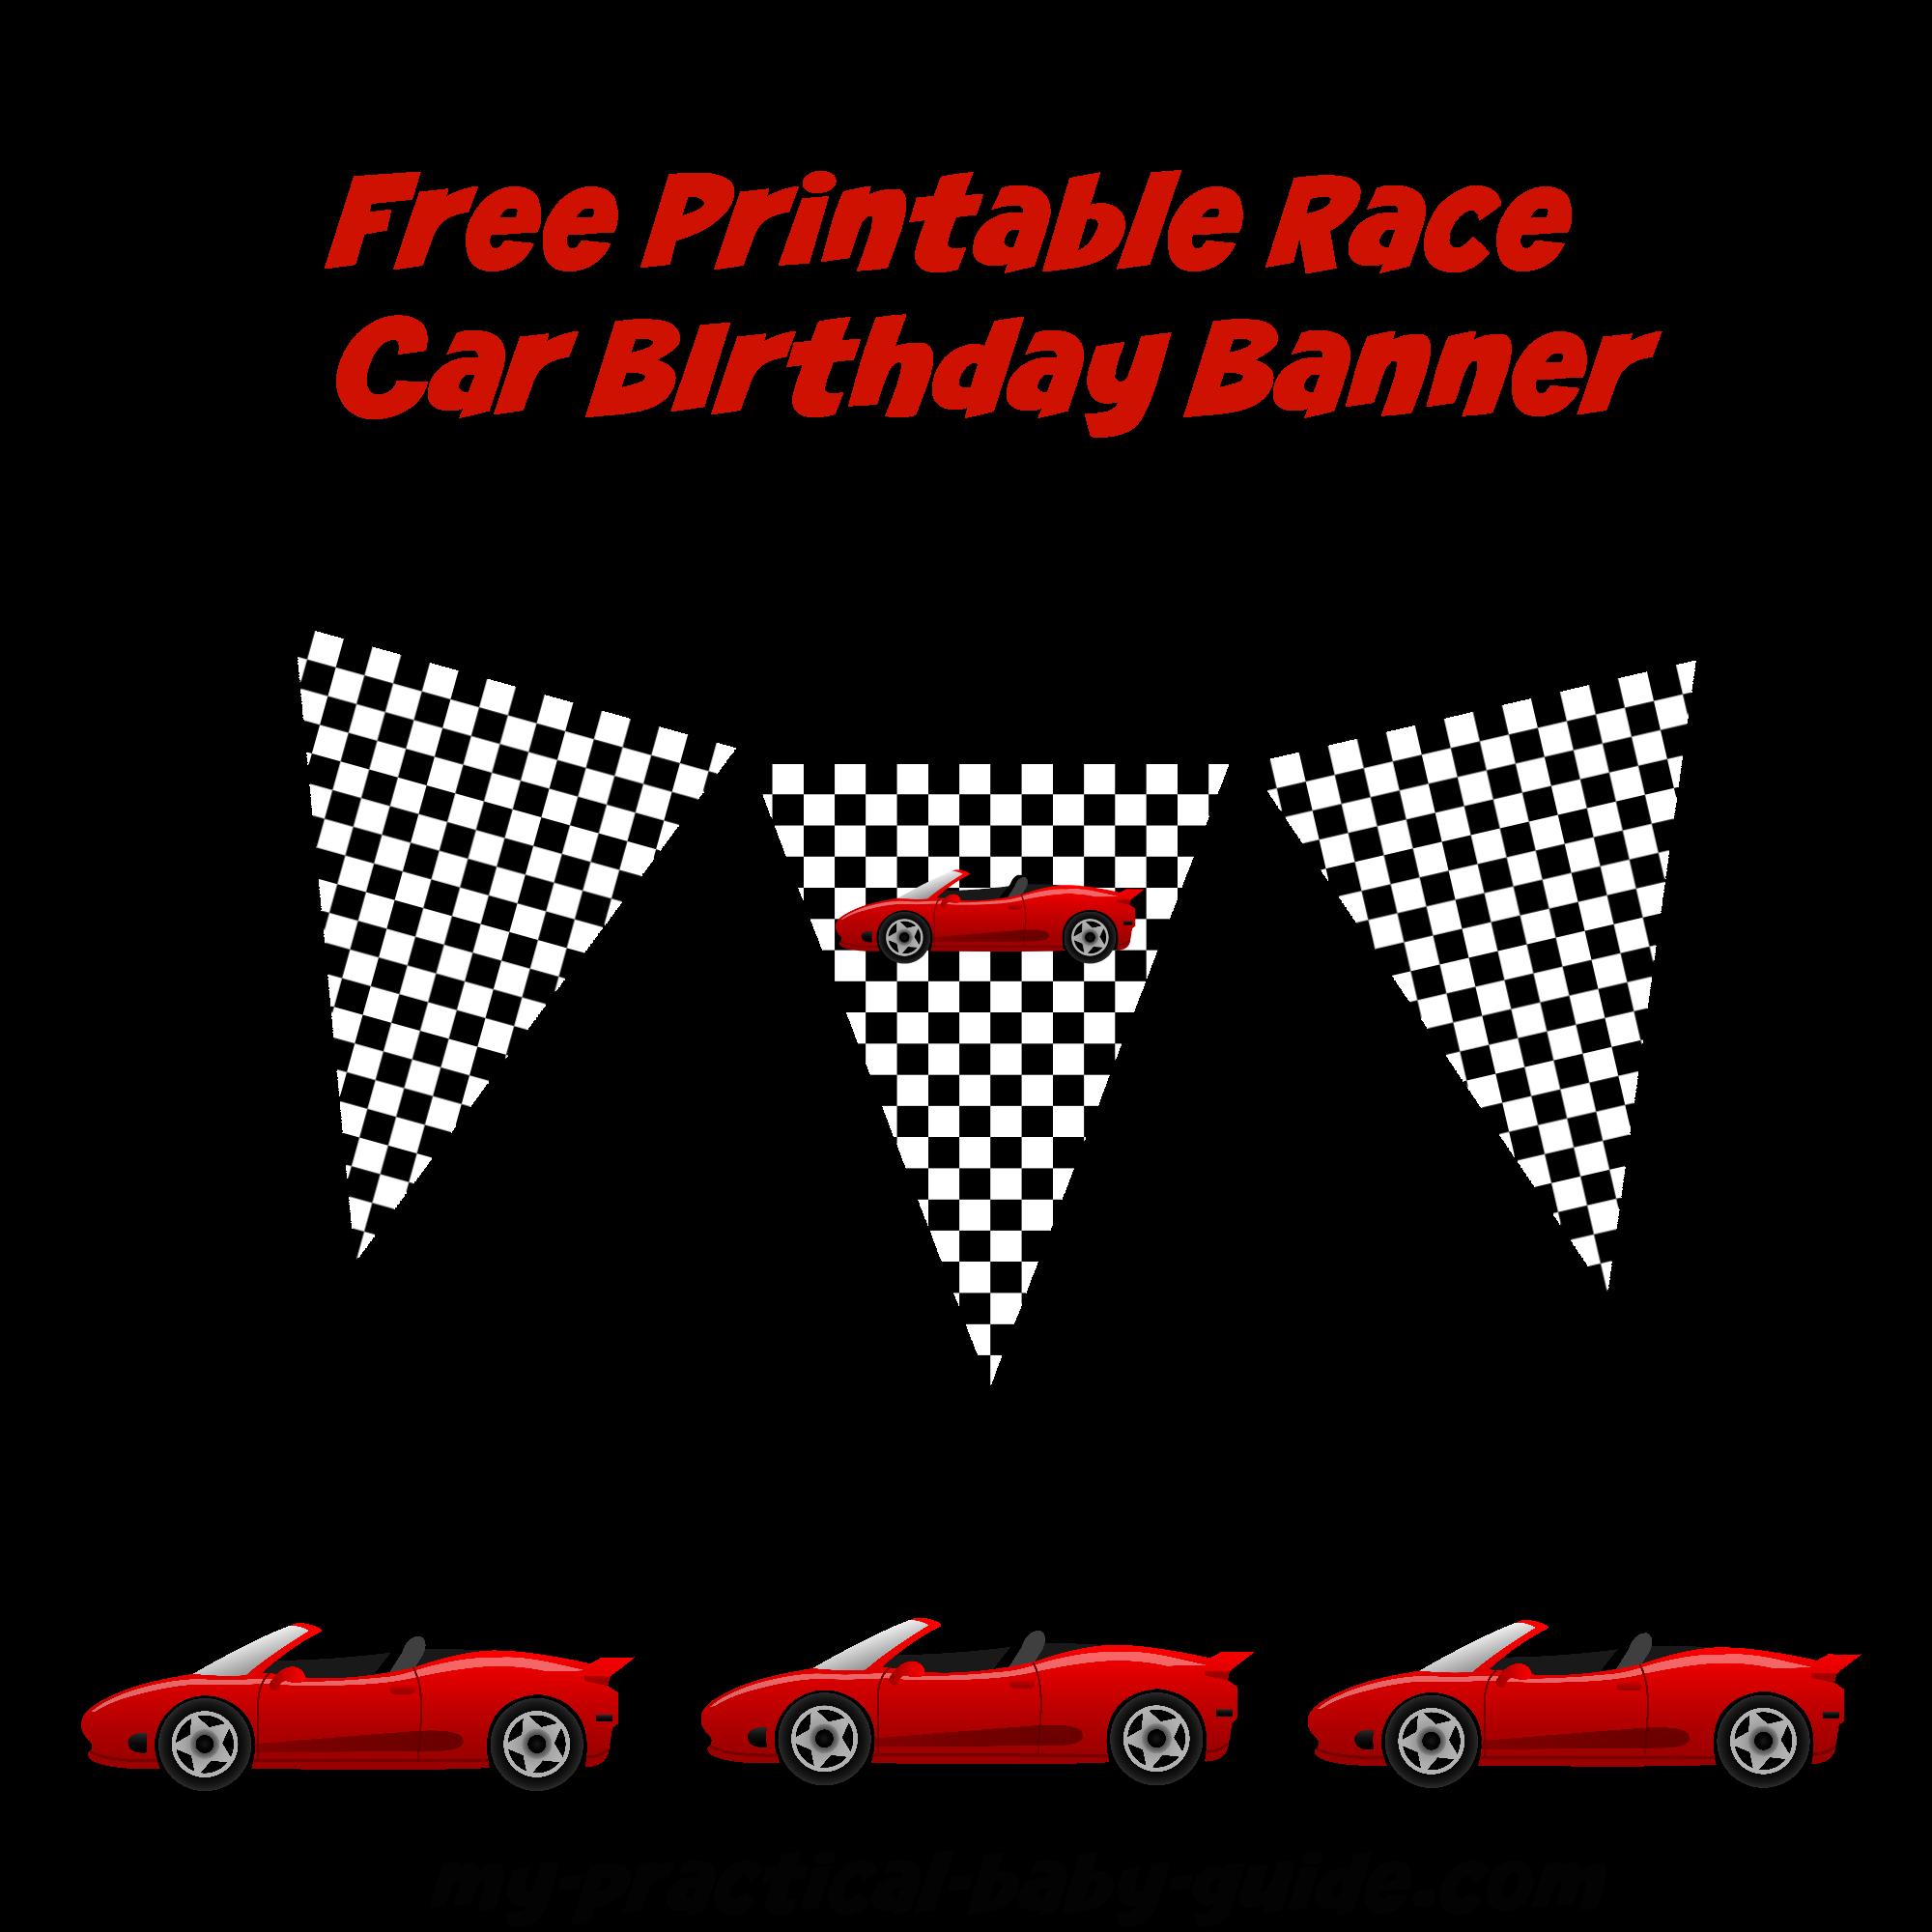 Coolest Car Birthday Ideas My Practical Birthday Guide